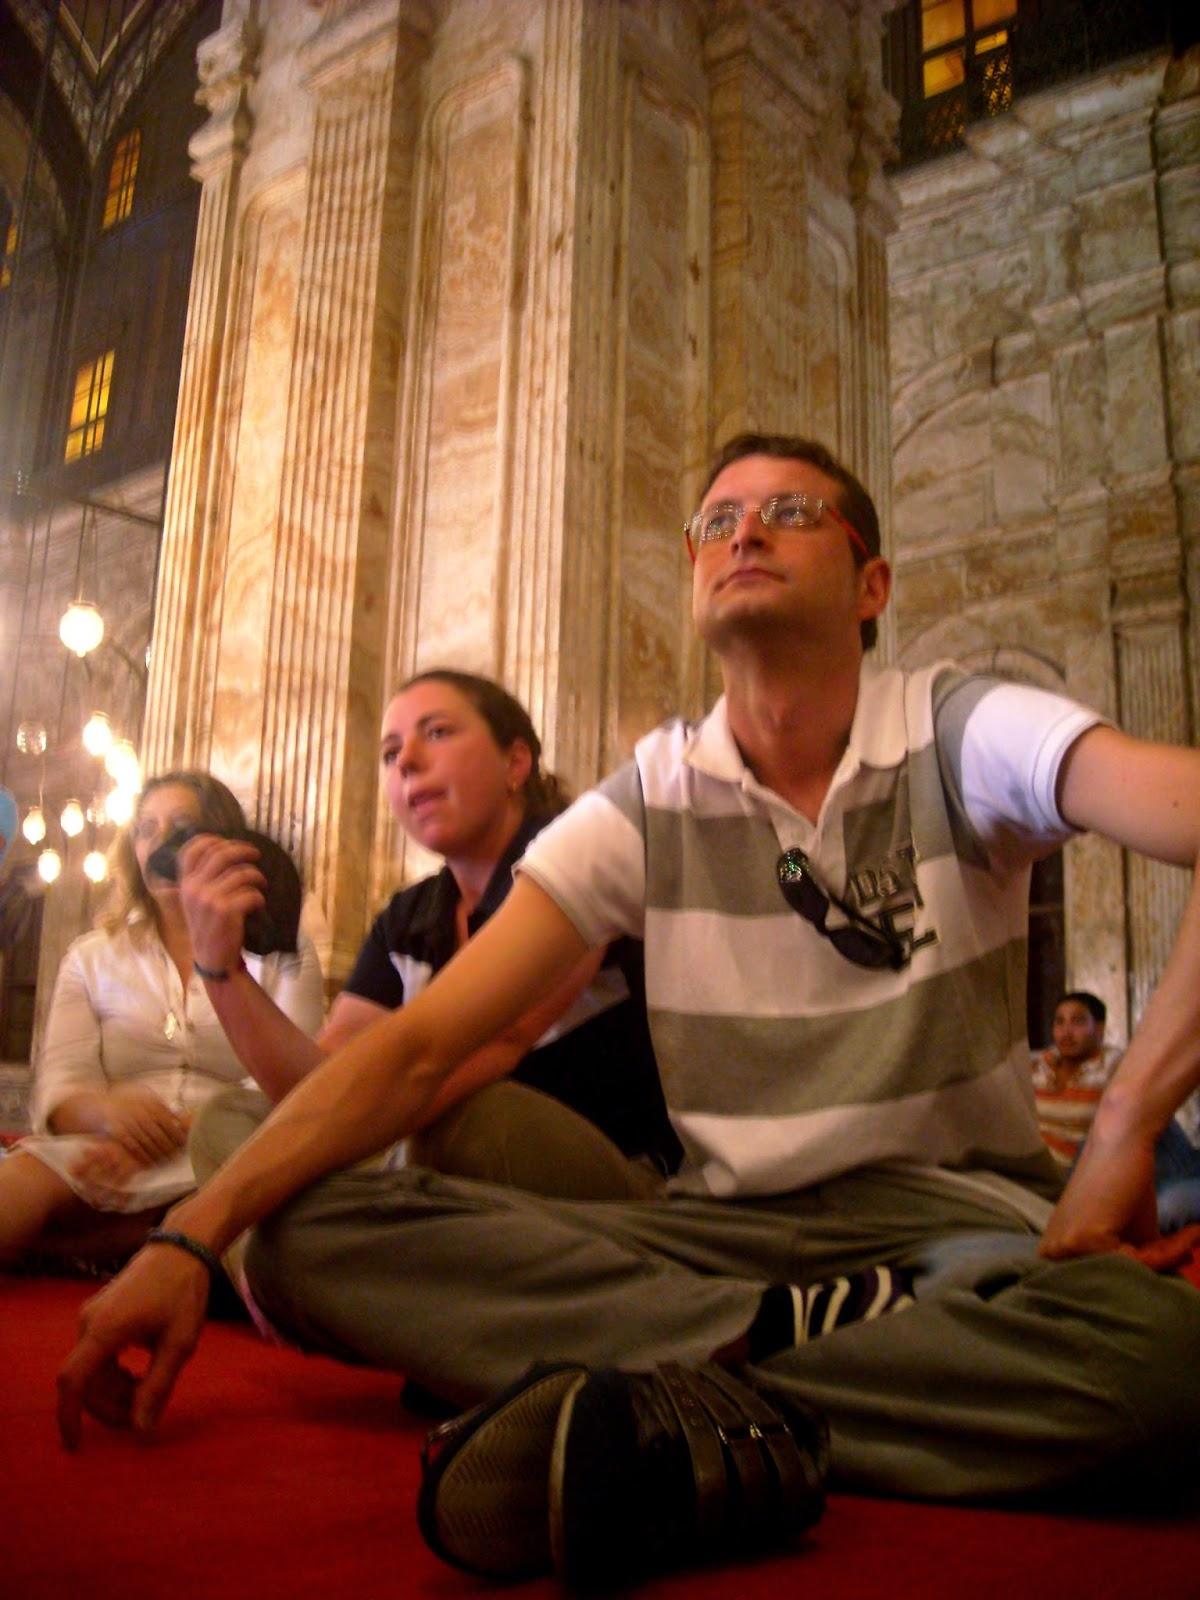 ciudadela saladino mezquita el cairo